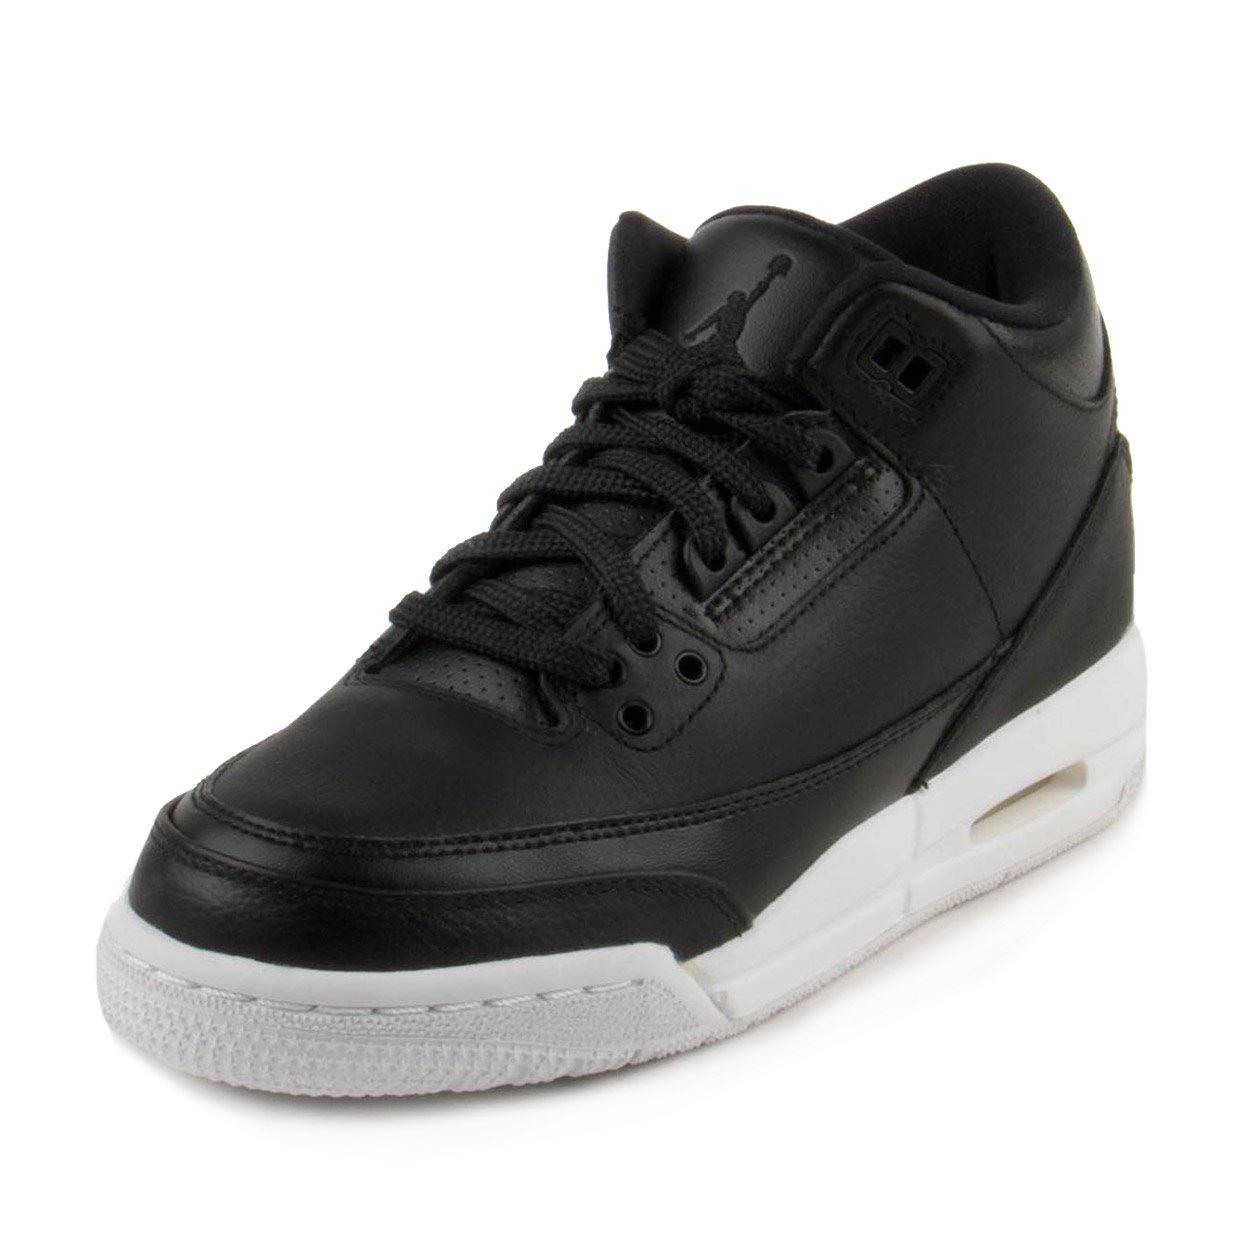 NIKE Jordan Air 3 Retro Bg Boys Basketball Shoes (7Y, Black/Black/White) by Jordan (Image #1)